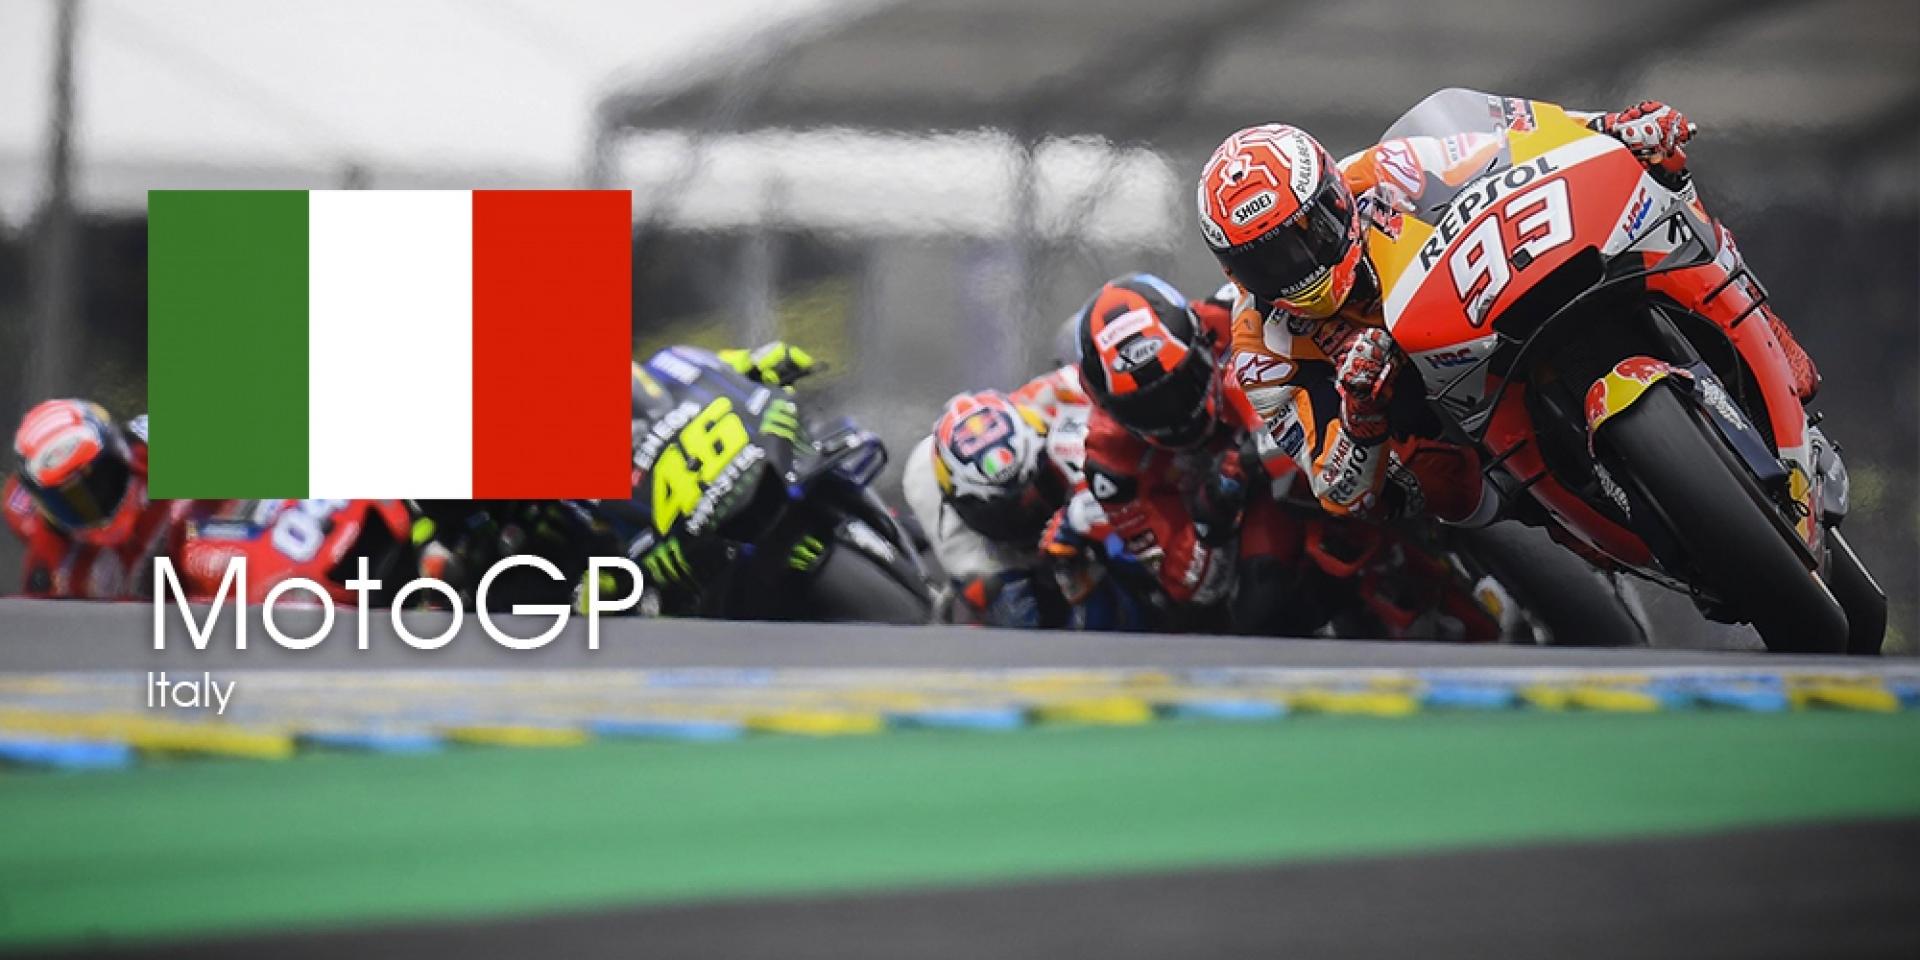 MotoGP 2019 義大利站 轉播時間   SUPERMOTO8